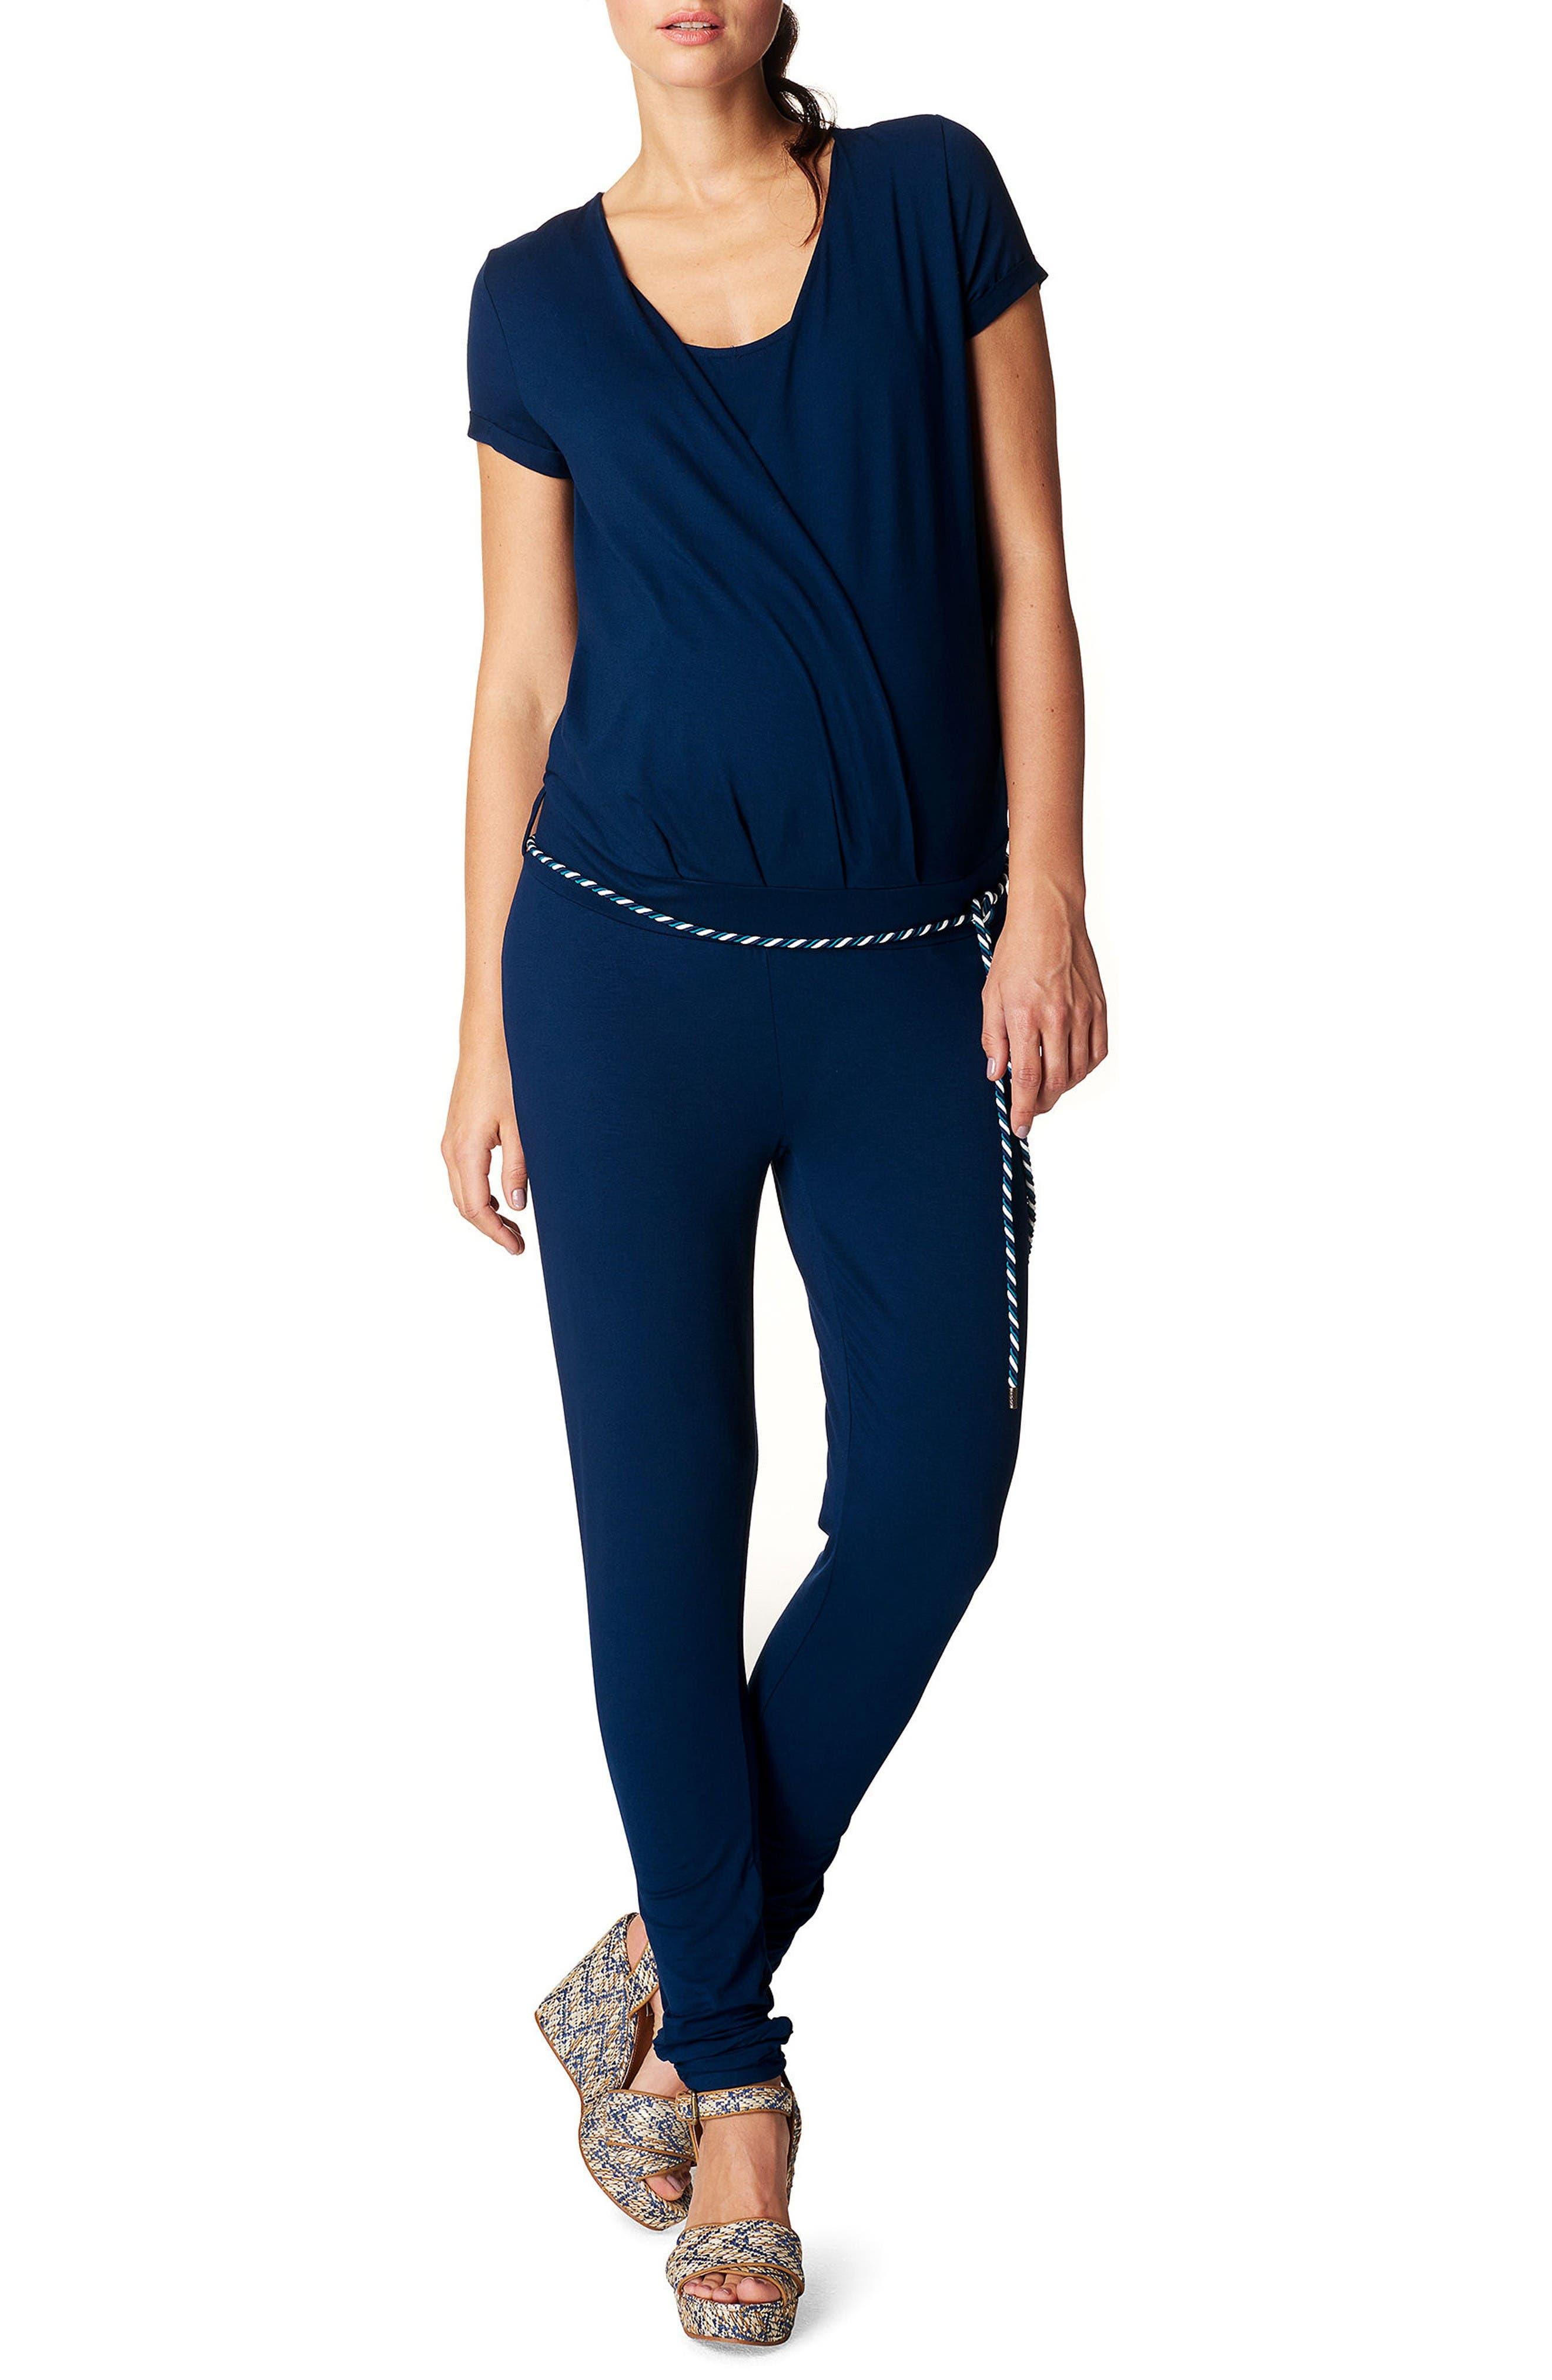 Chloe Maternity Jumpsuit,                         Main,                         color, Midnight Blue